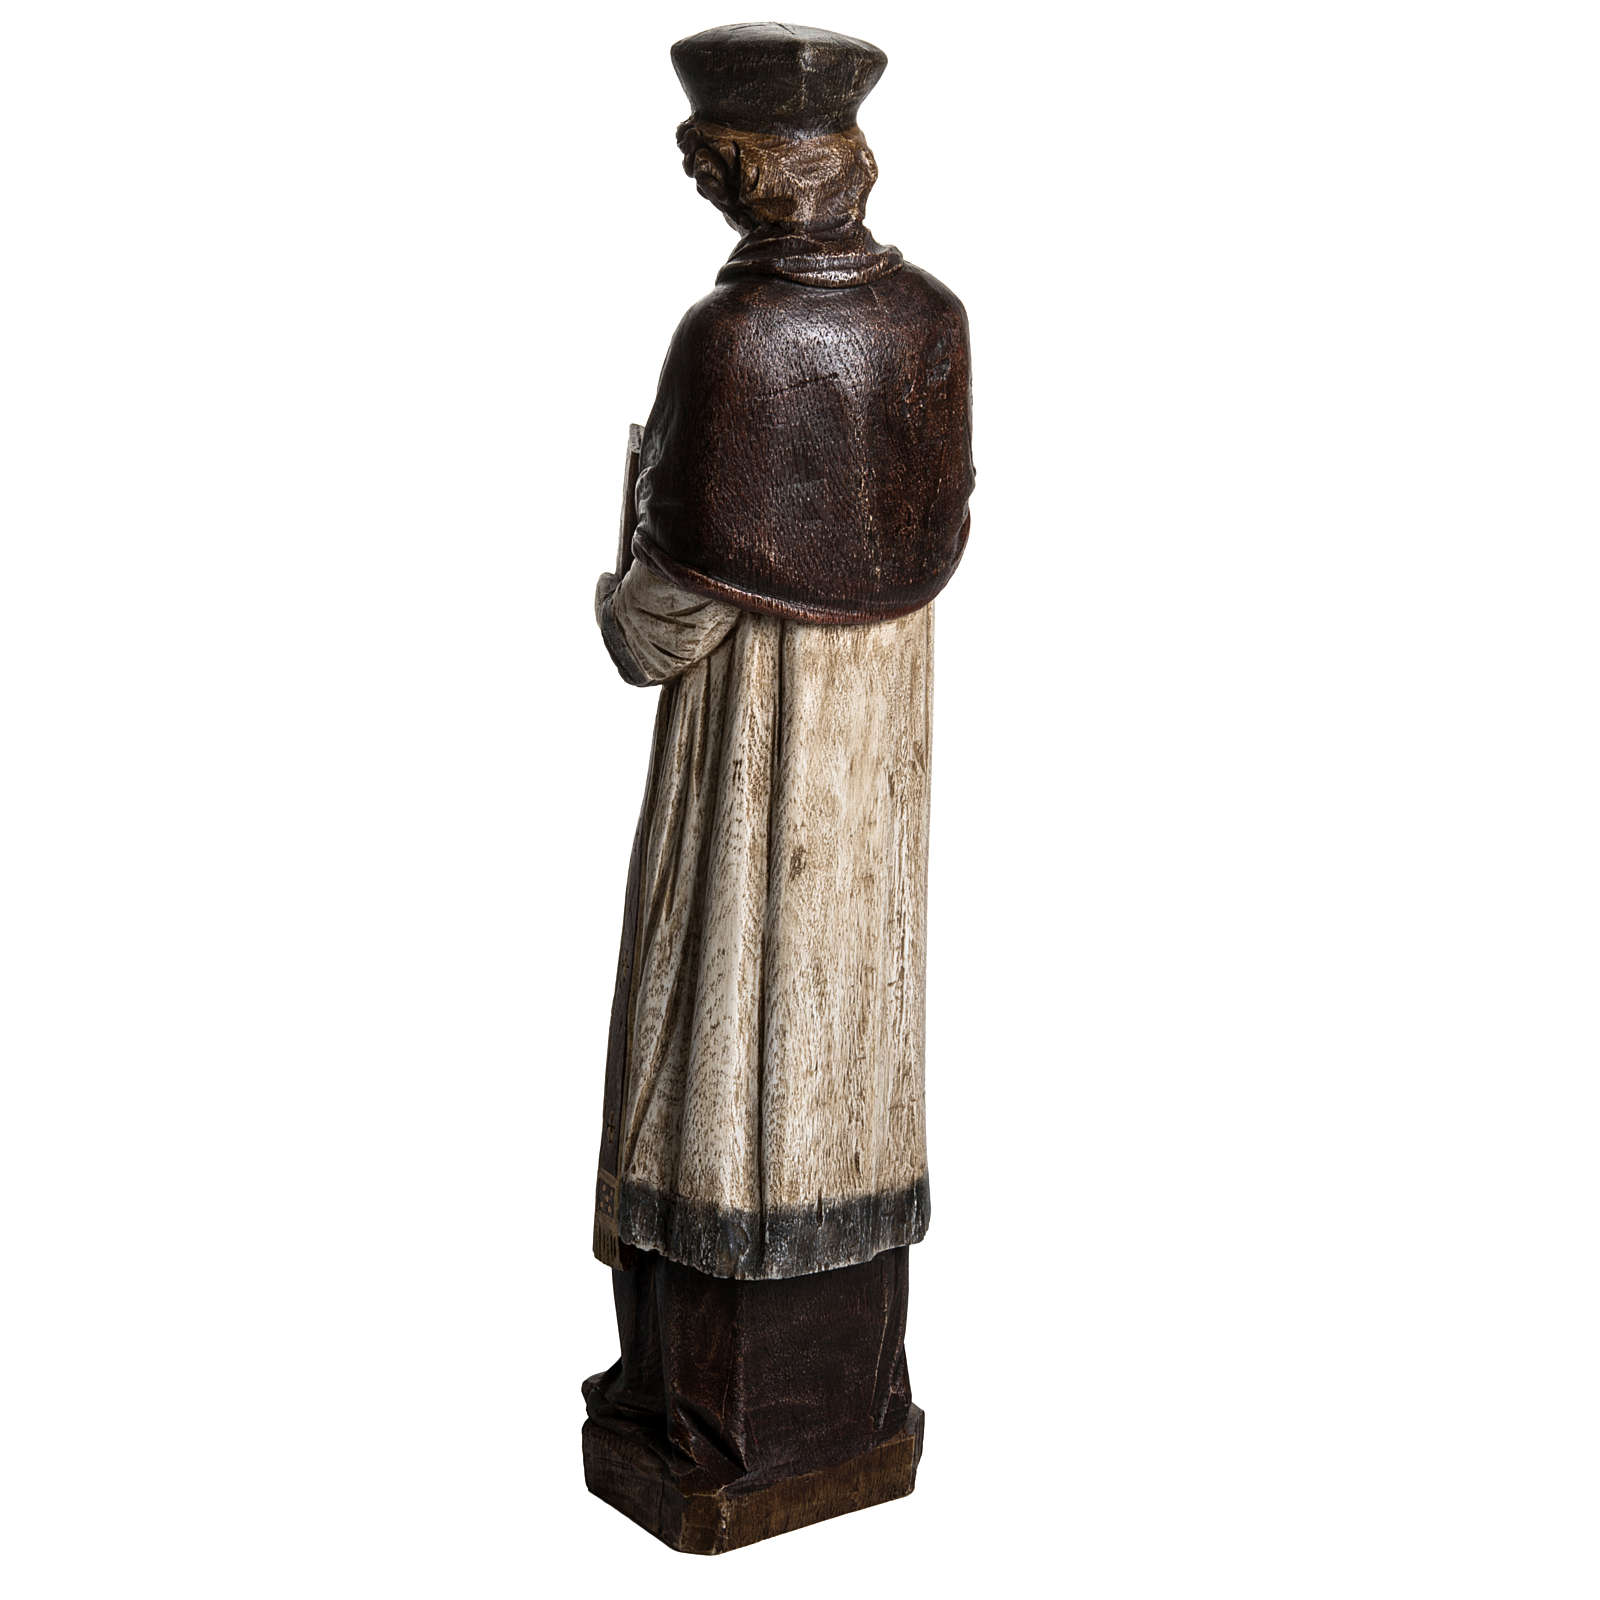 St. Yves (Ivo) pietra finitura legno 63 cm 4